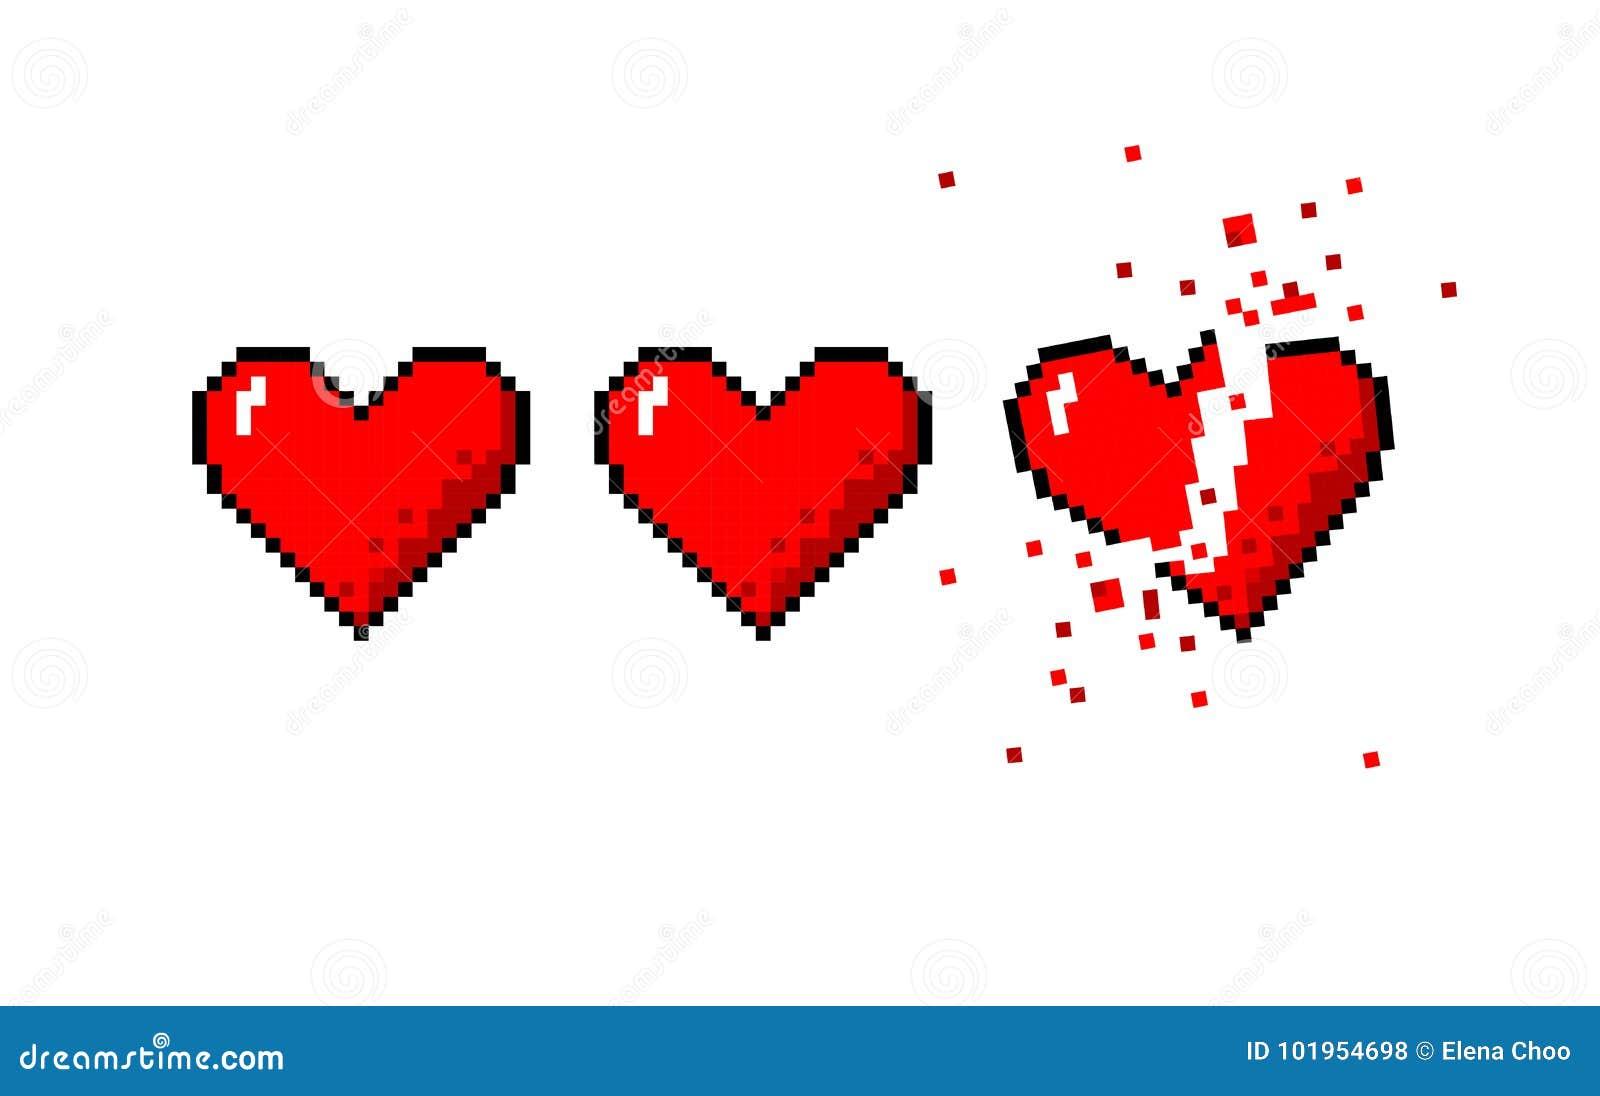 Healthbar Of Hearts And One Broken Heart Stock Vector